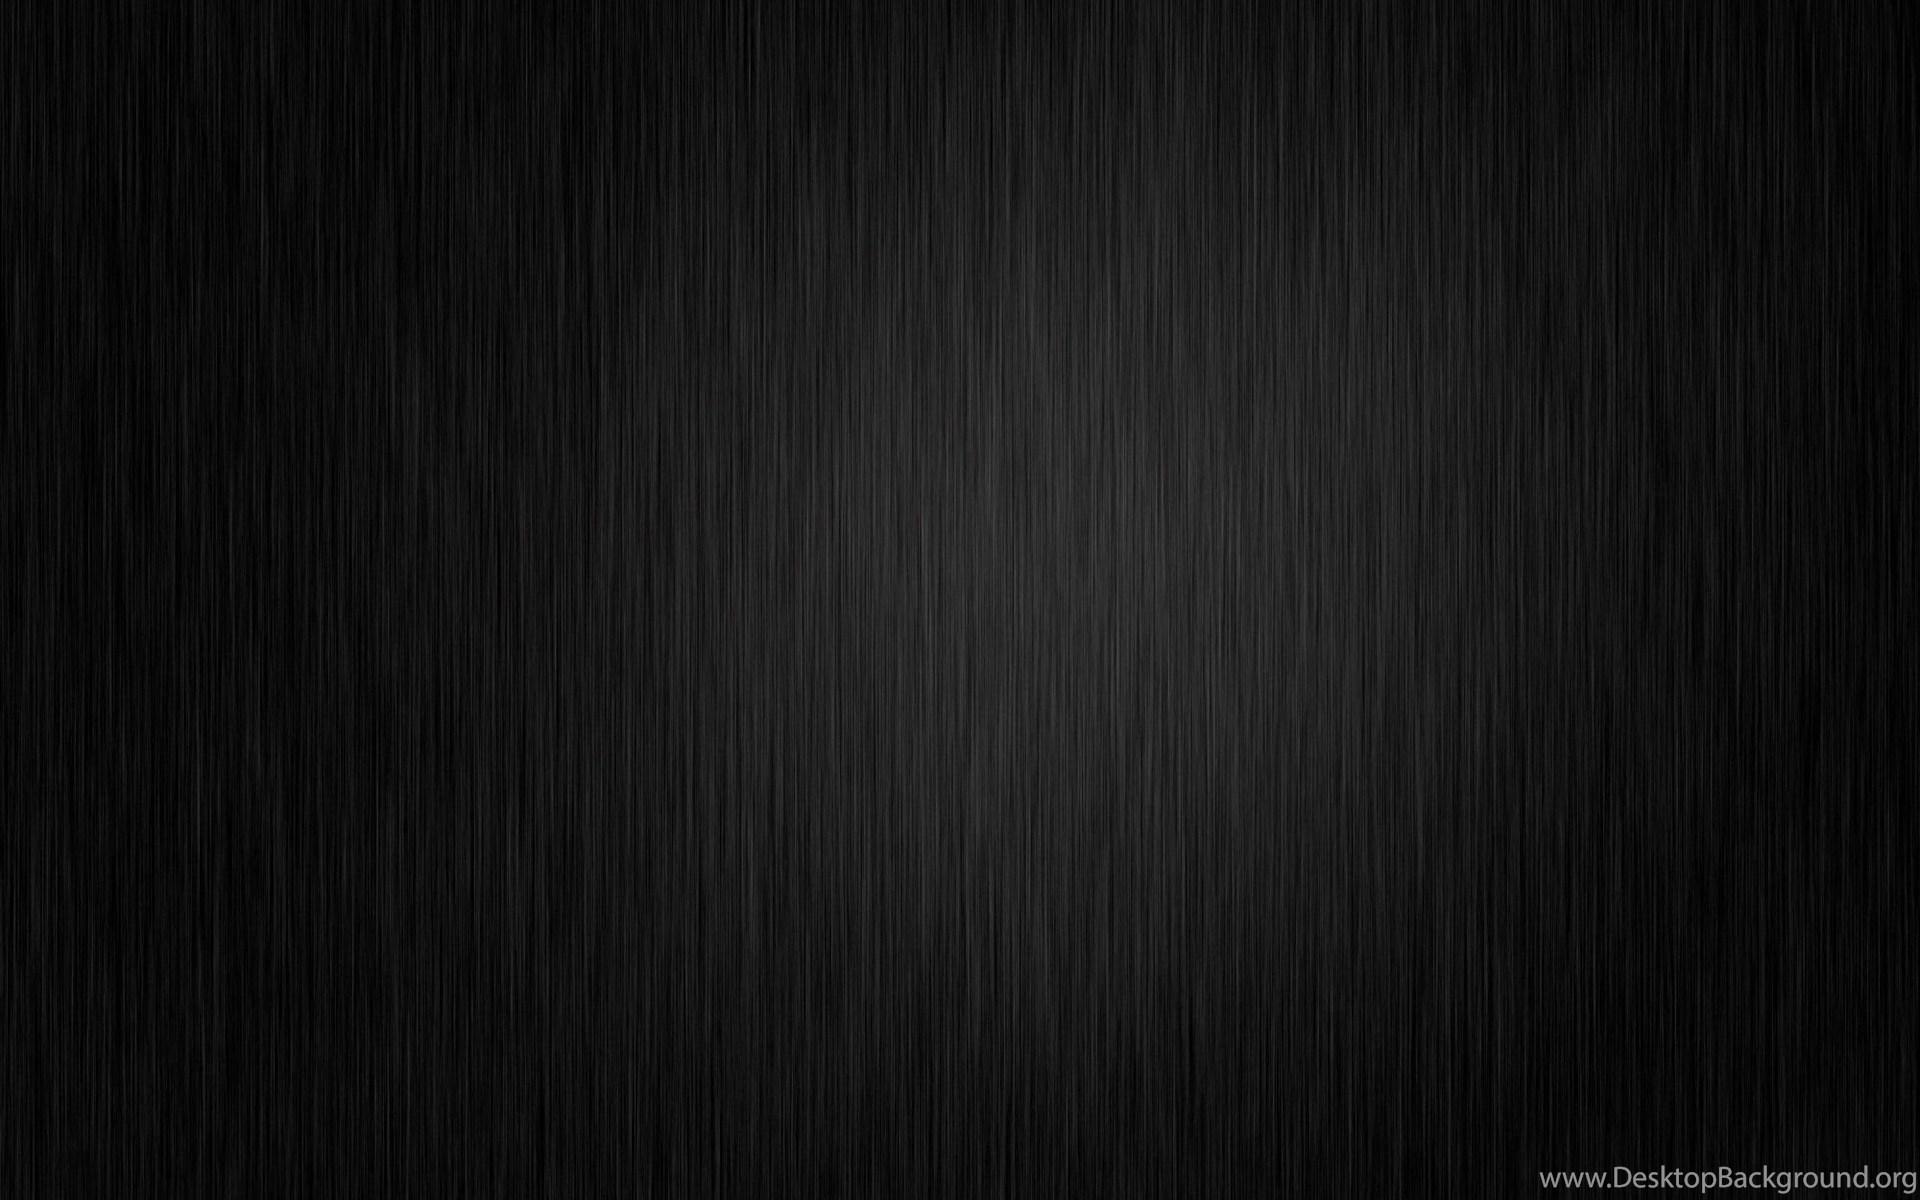 Blank Black Wallpapers Wallpapers Hd Base Desktop Background